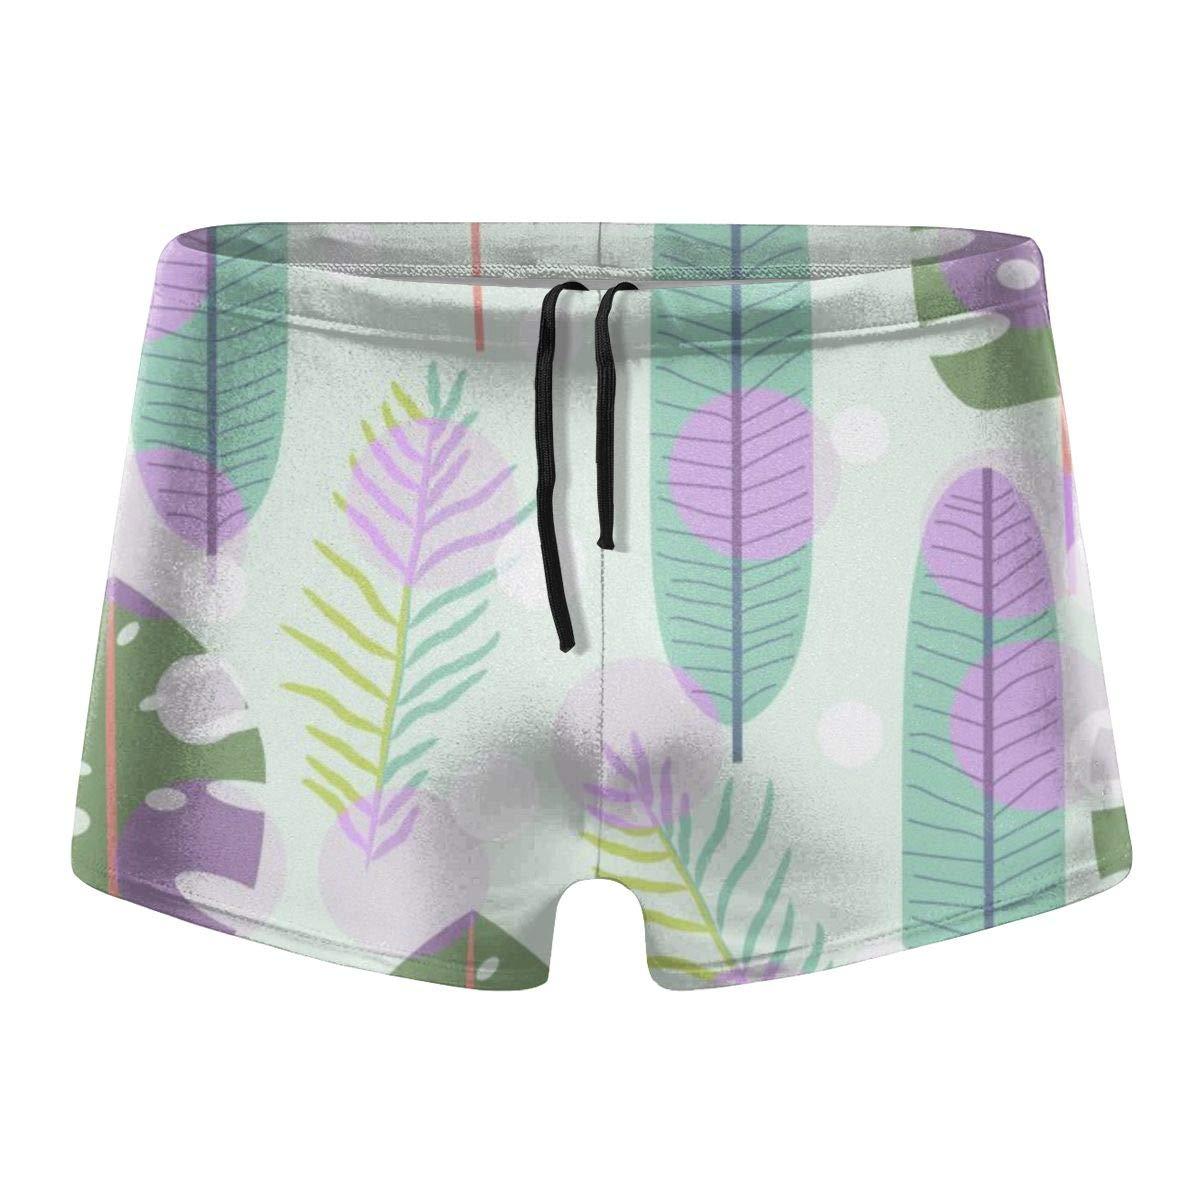 G66TCX Mens Boxer Swimwear Geometric Board Shorts Square Leg Board Shorts Swimsuit Swim Underwear